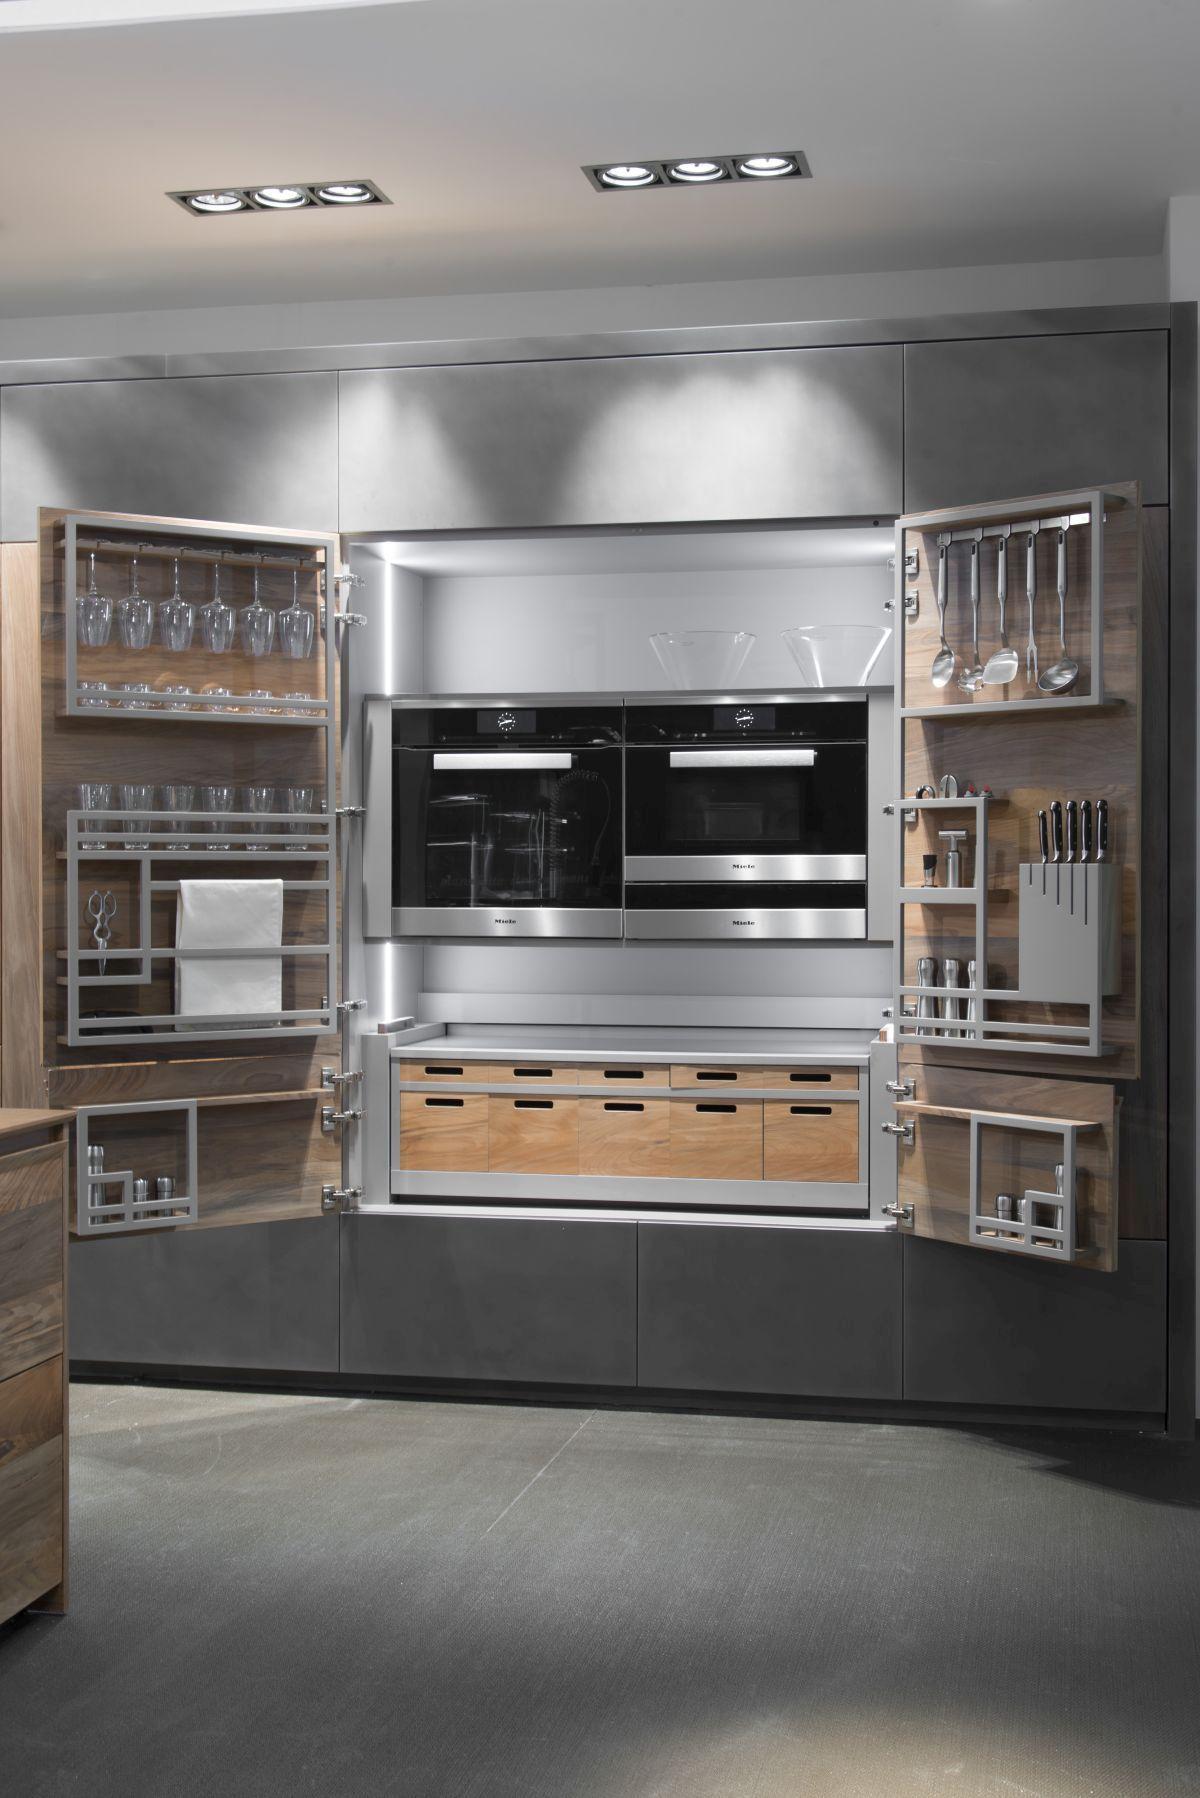 Fabricant Italien De Cuisine toncelli brings luxury to our homes through exquisite design